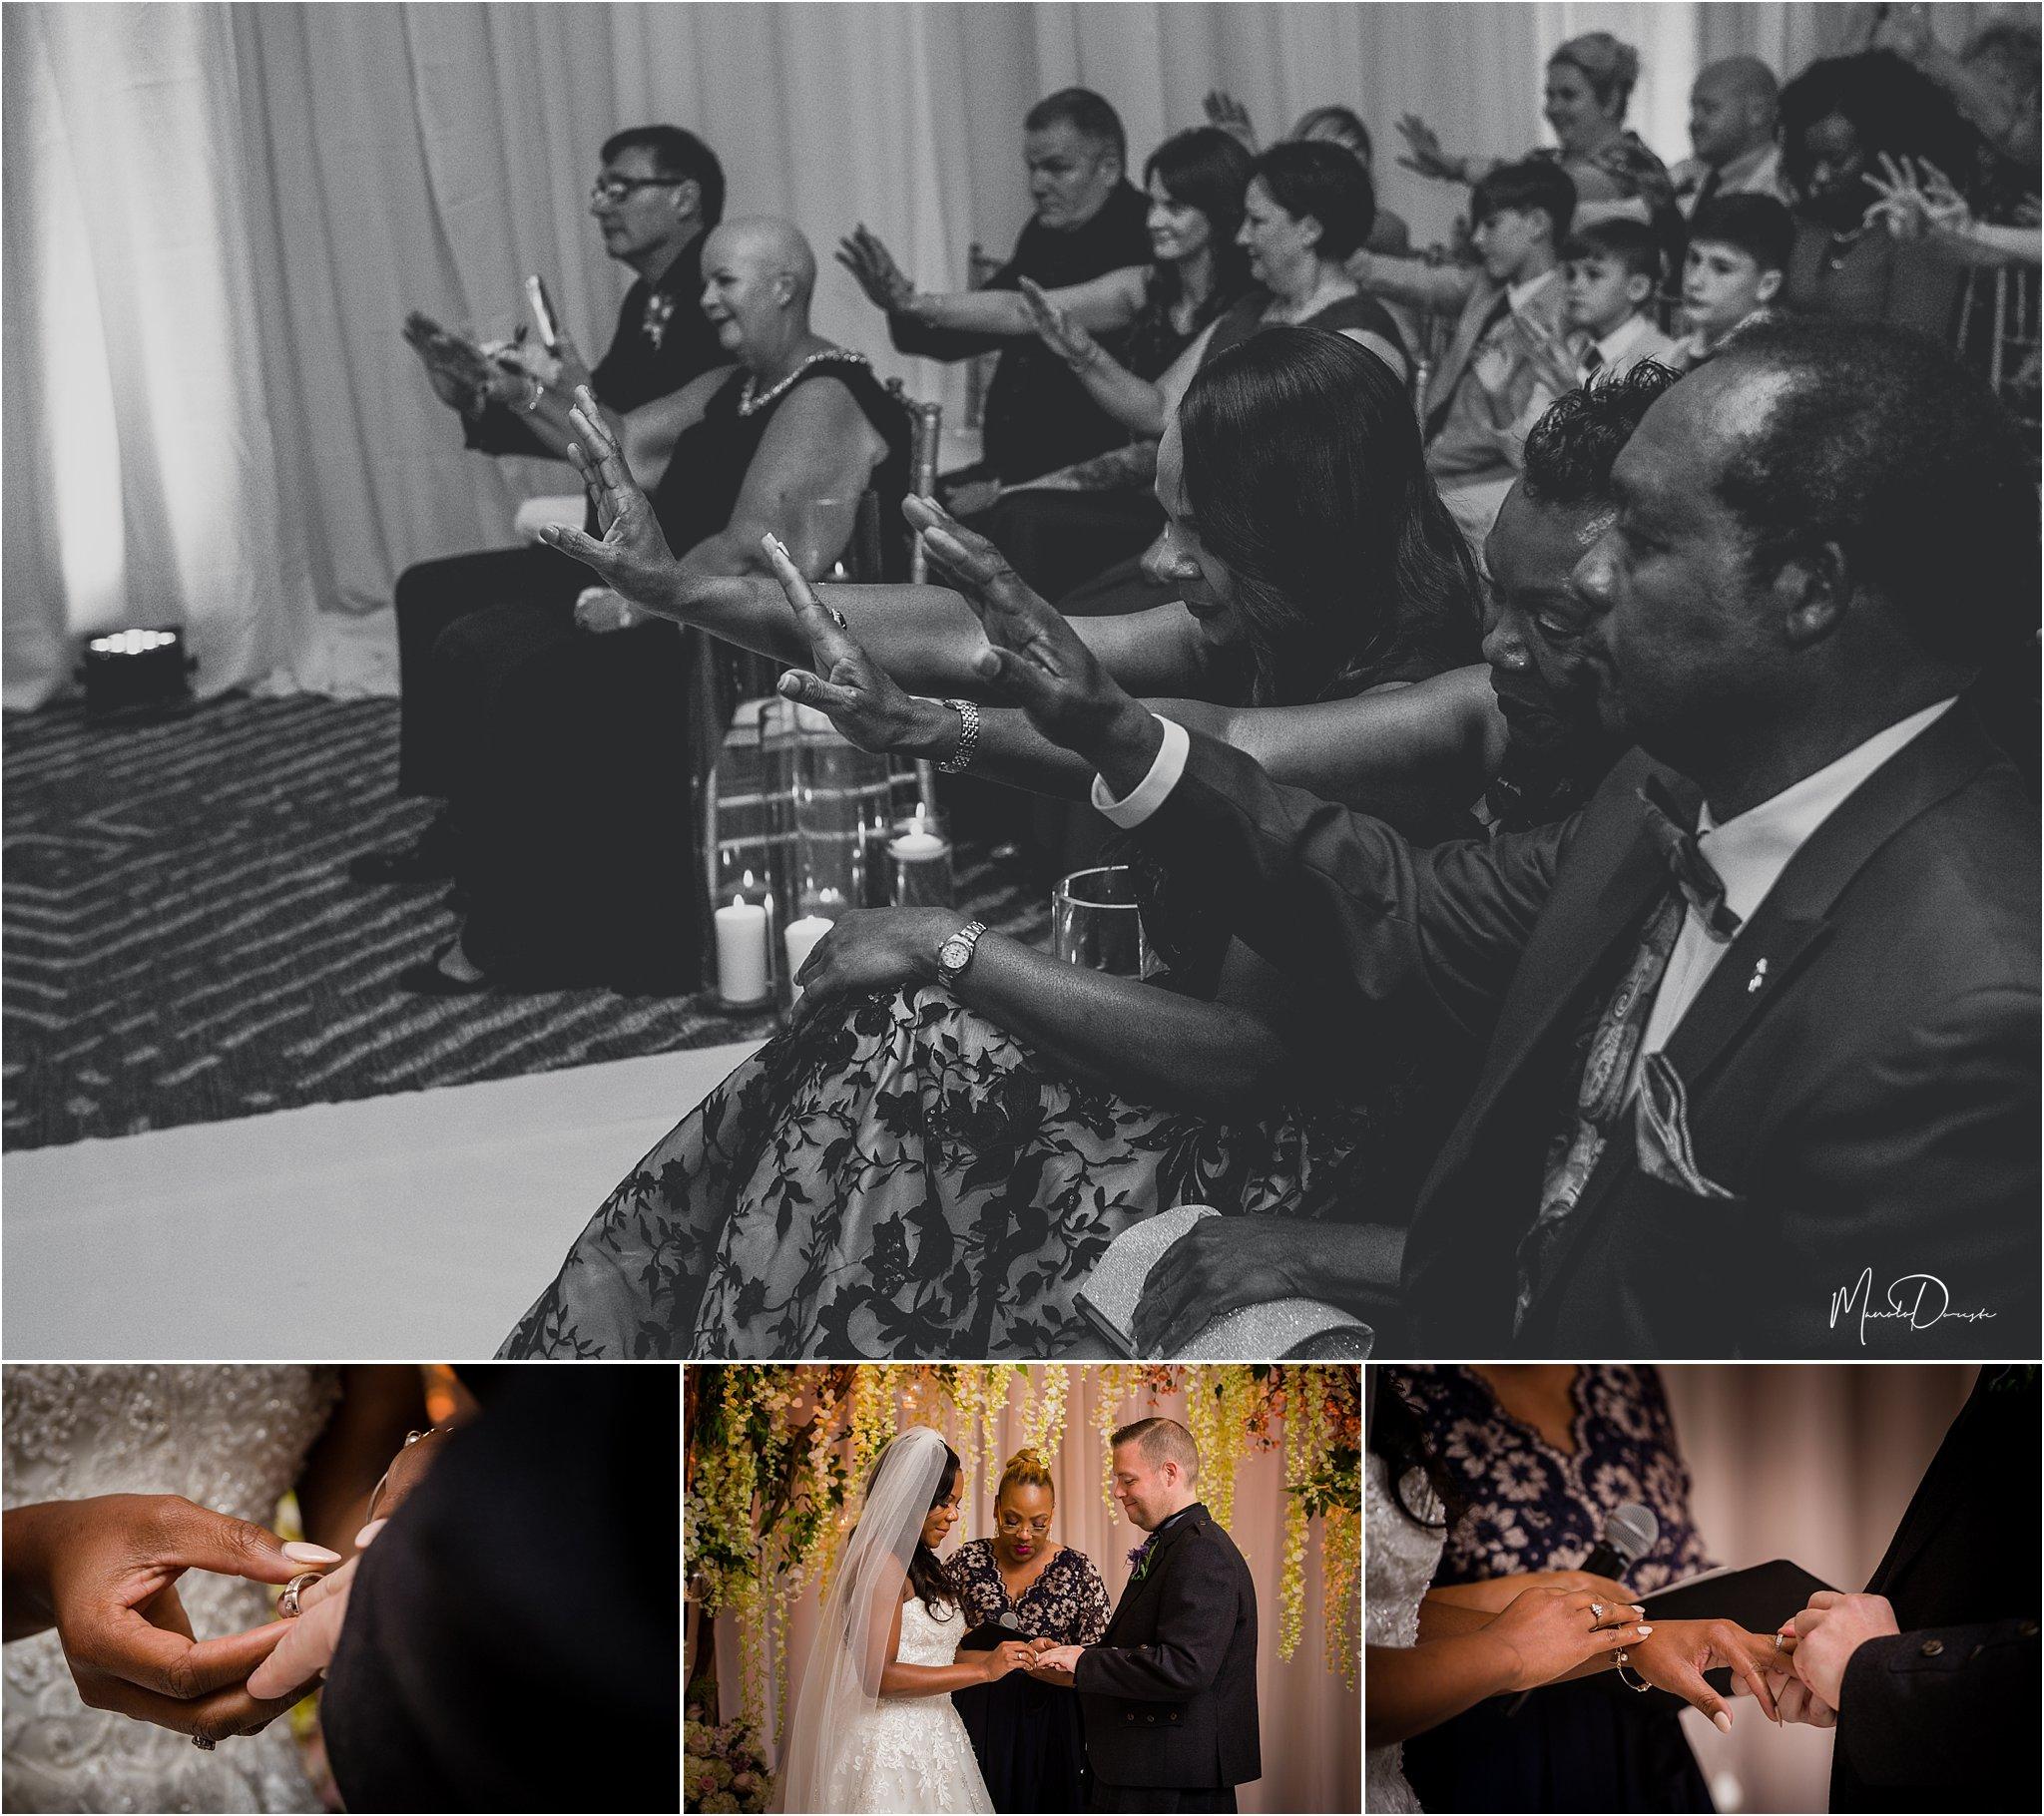 0120_ManoloDoreste_InFocusStudios_Wedding_Family_Photography_Miami_MiamiPhotographer.jpg